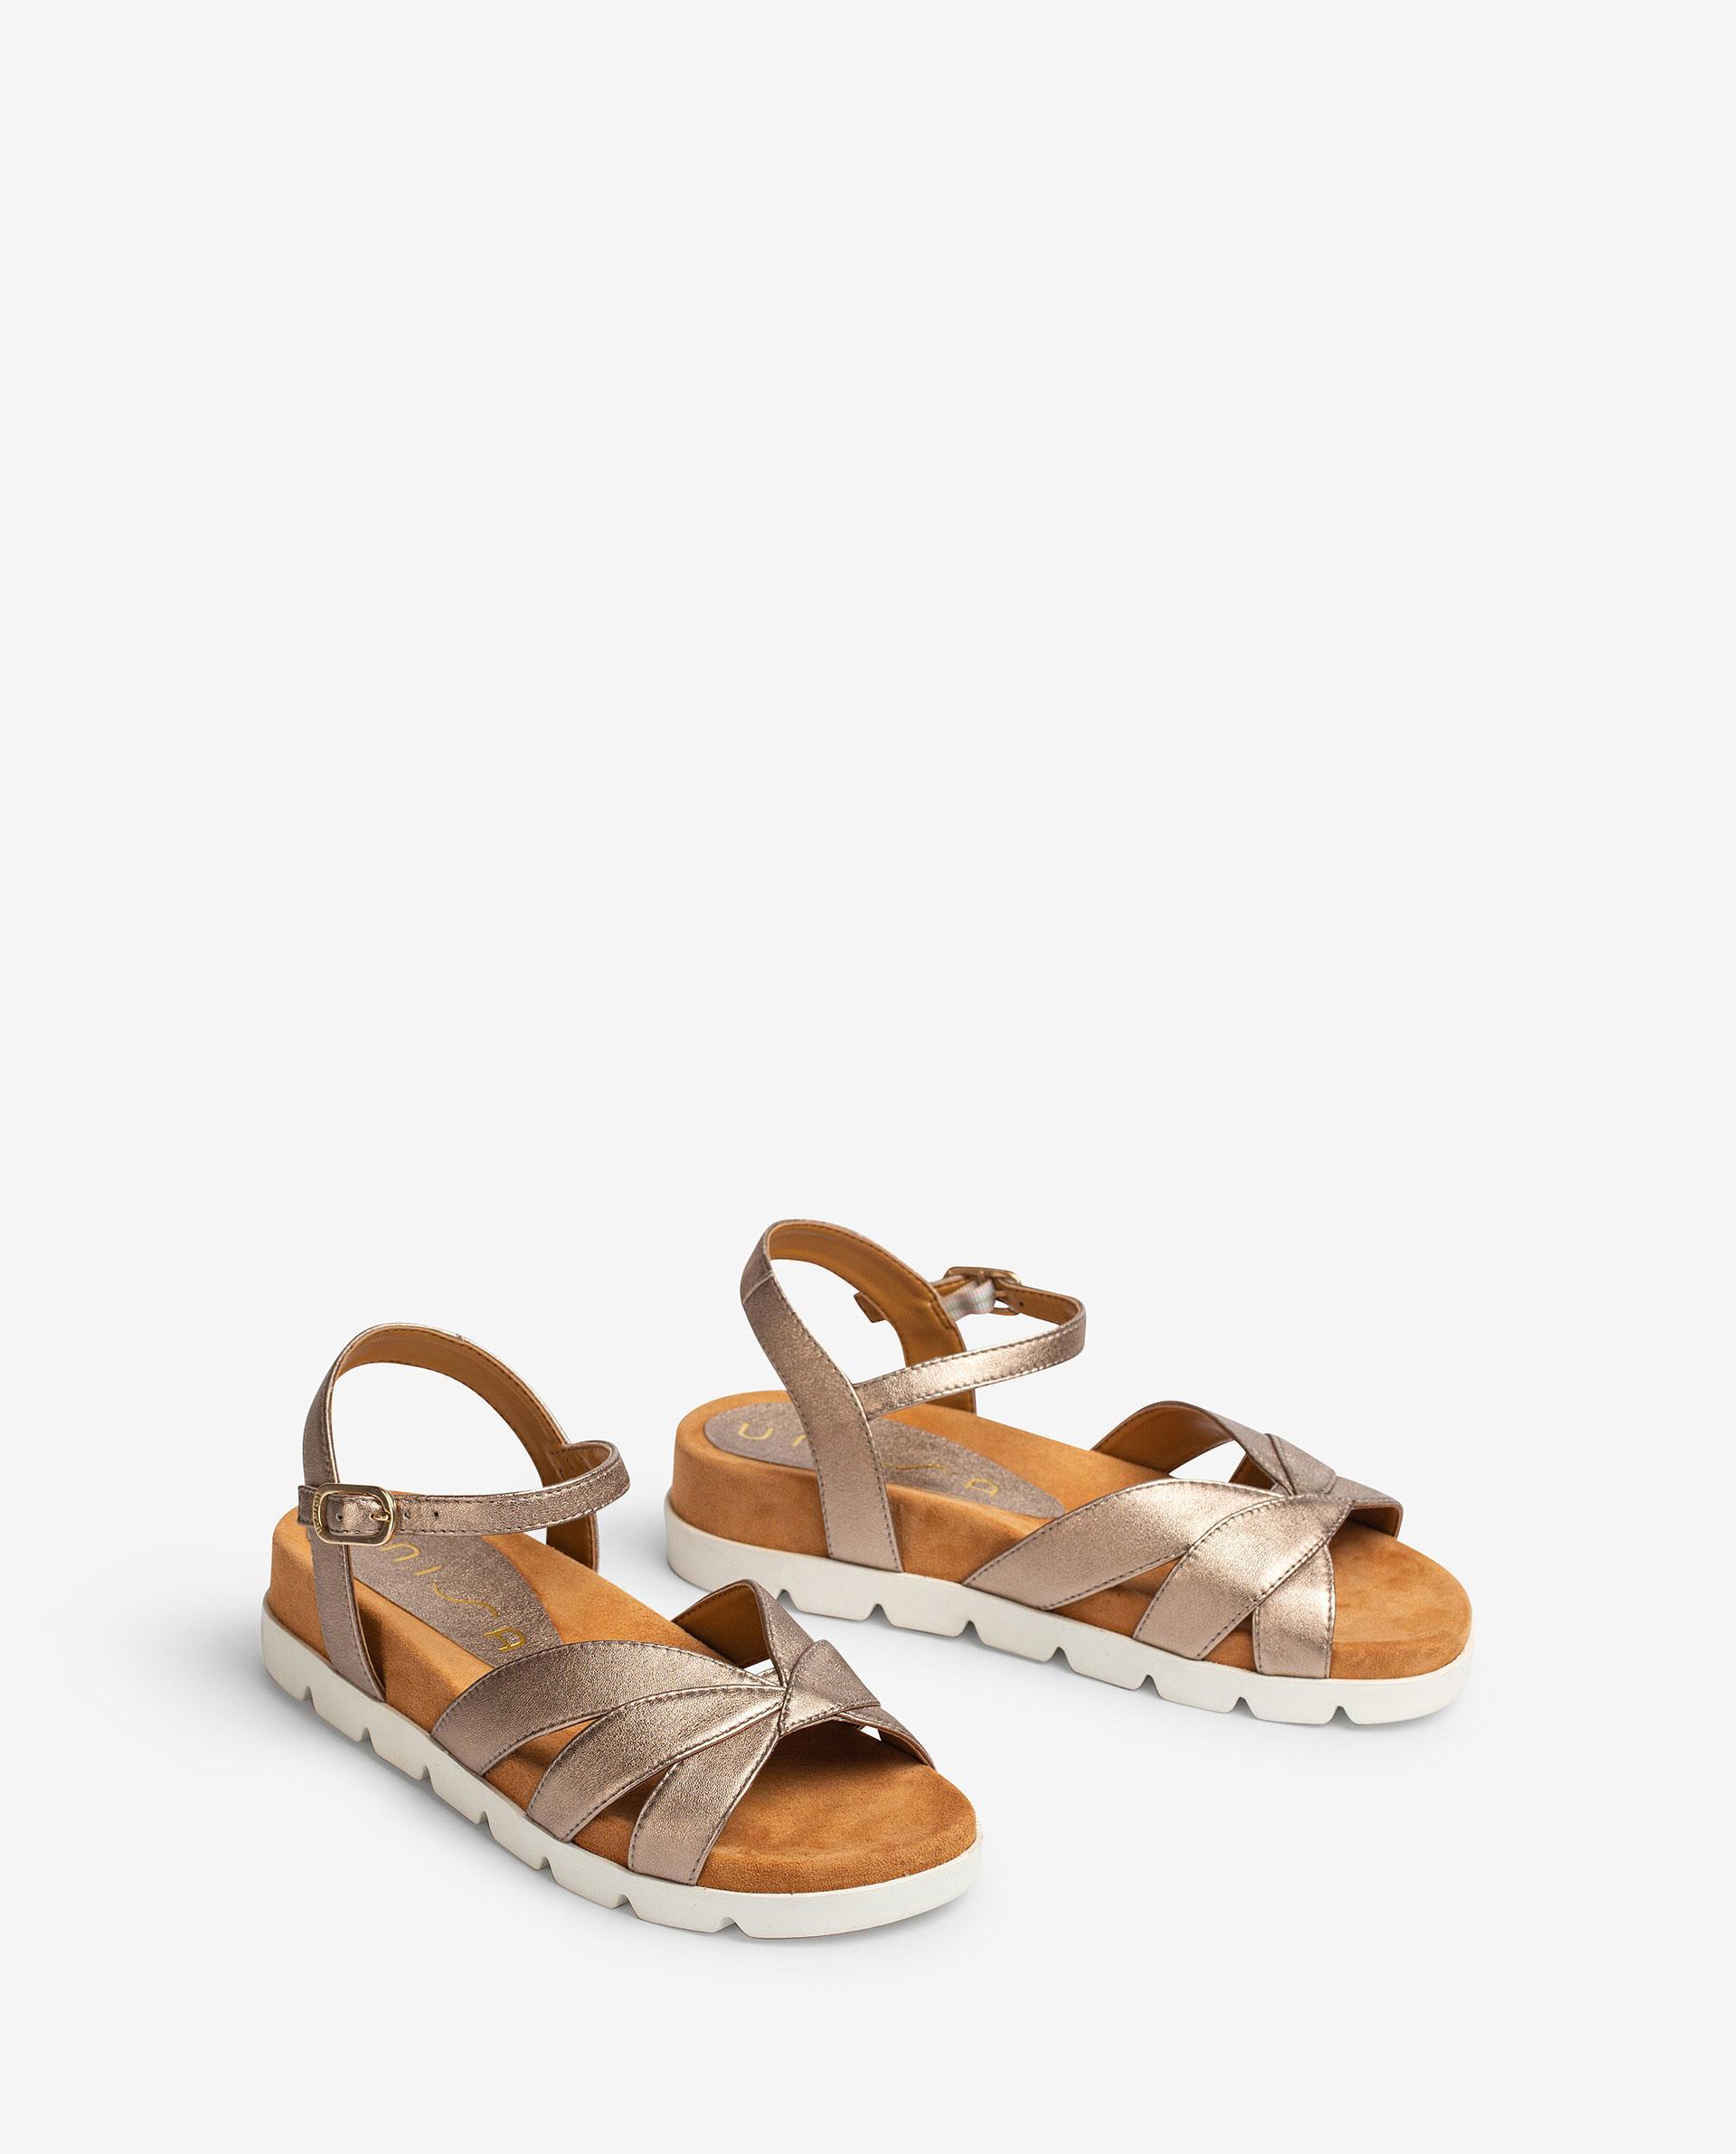 UNISA Flache Sandalen aus Metallic-Leder mit Sportsohle CEDILLO_LMT 5